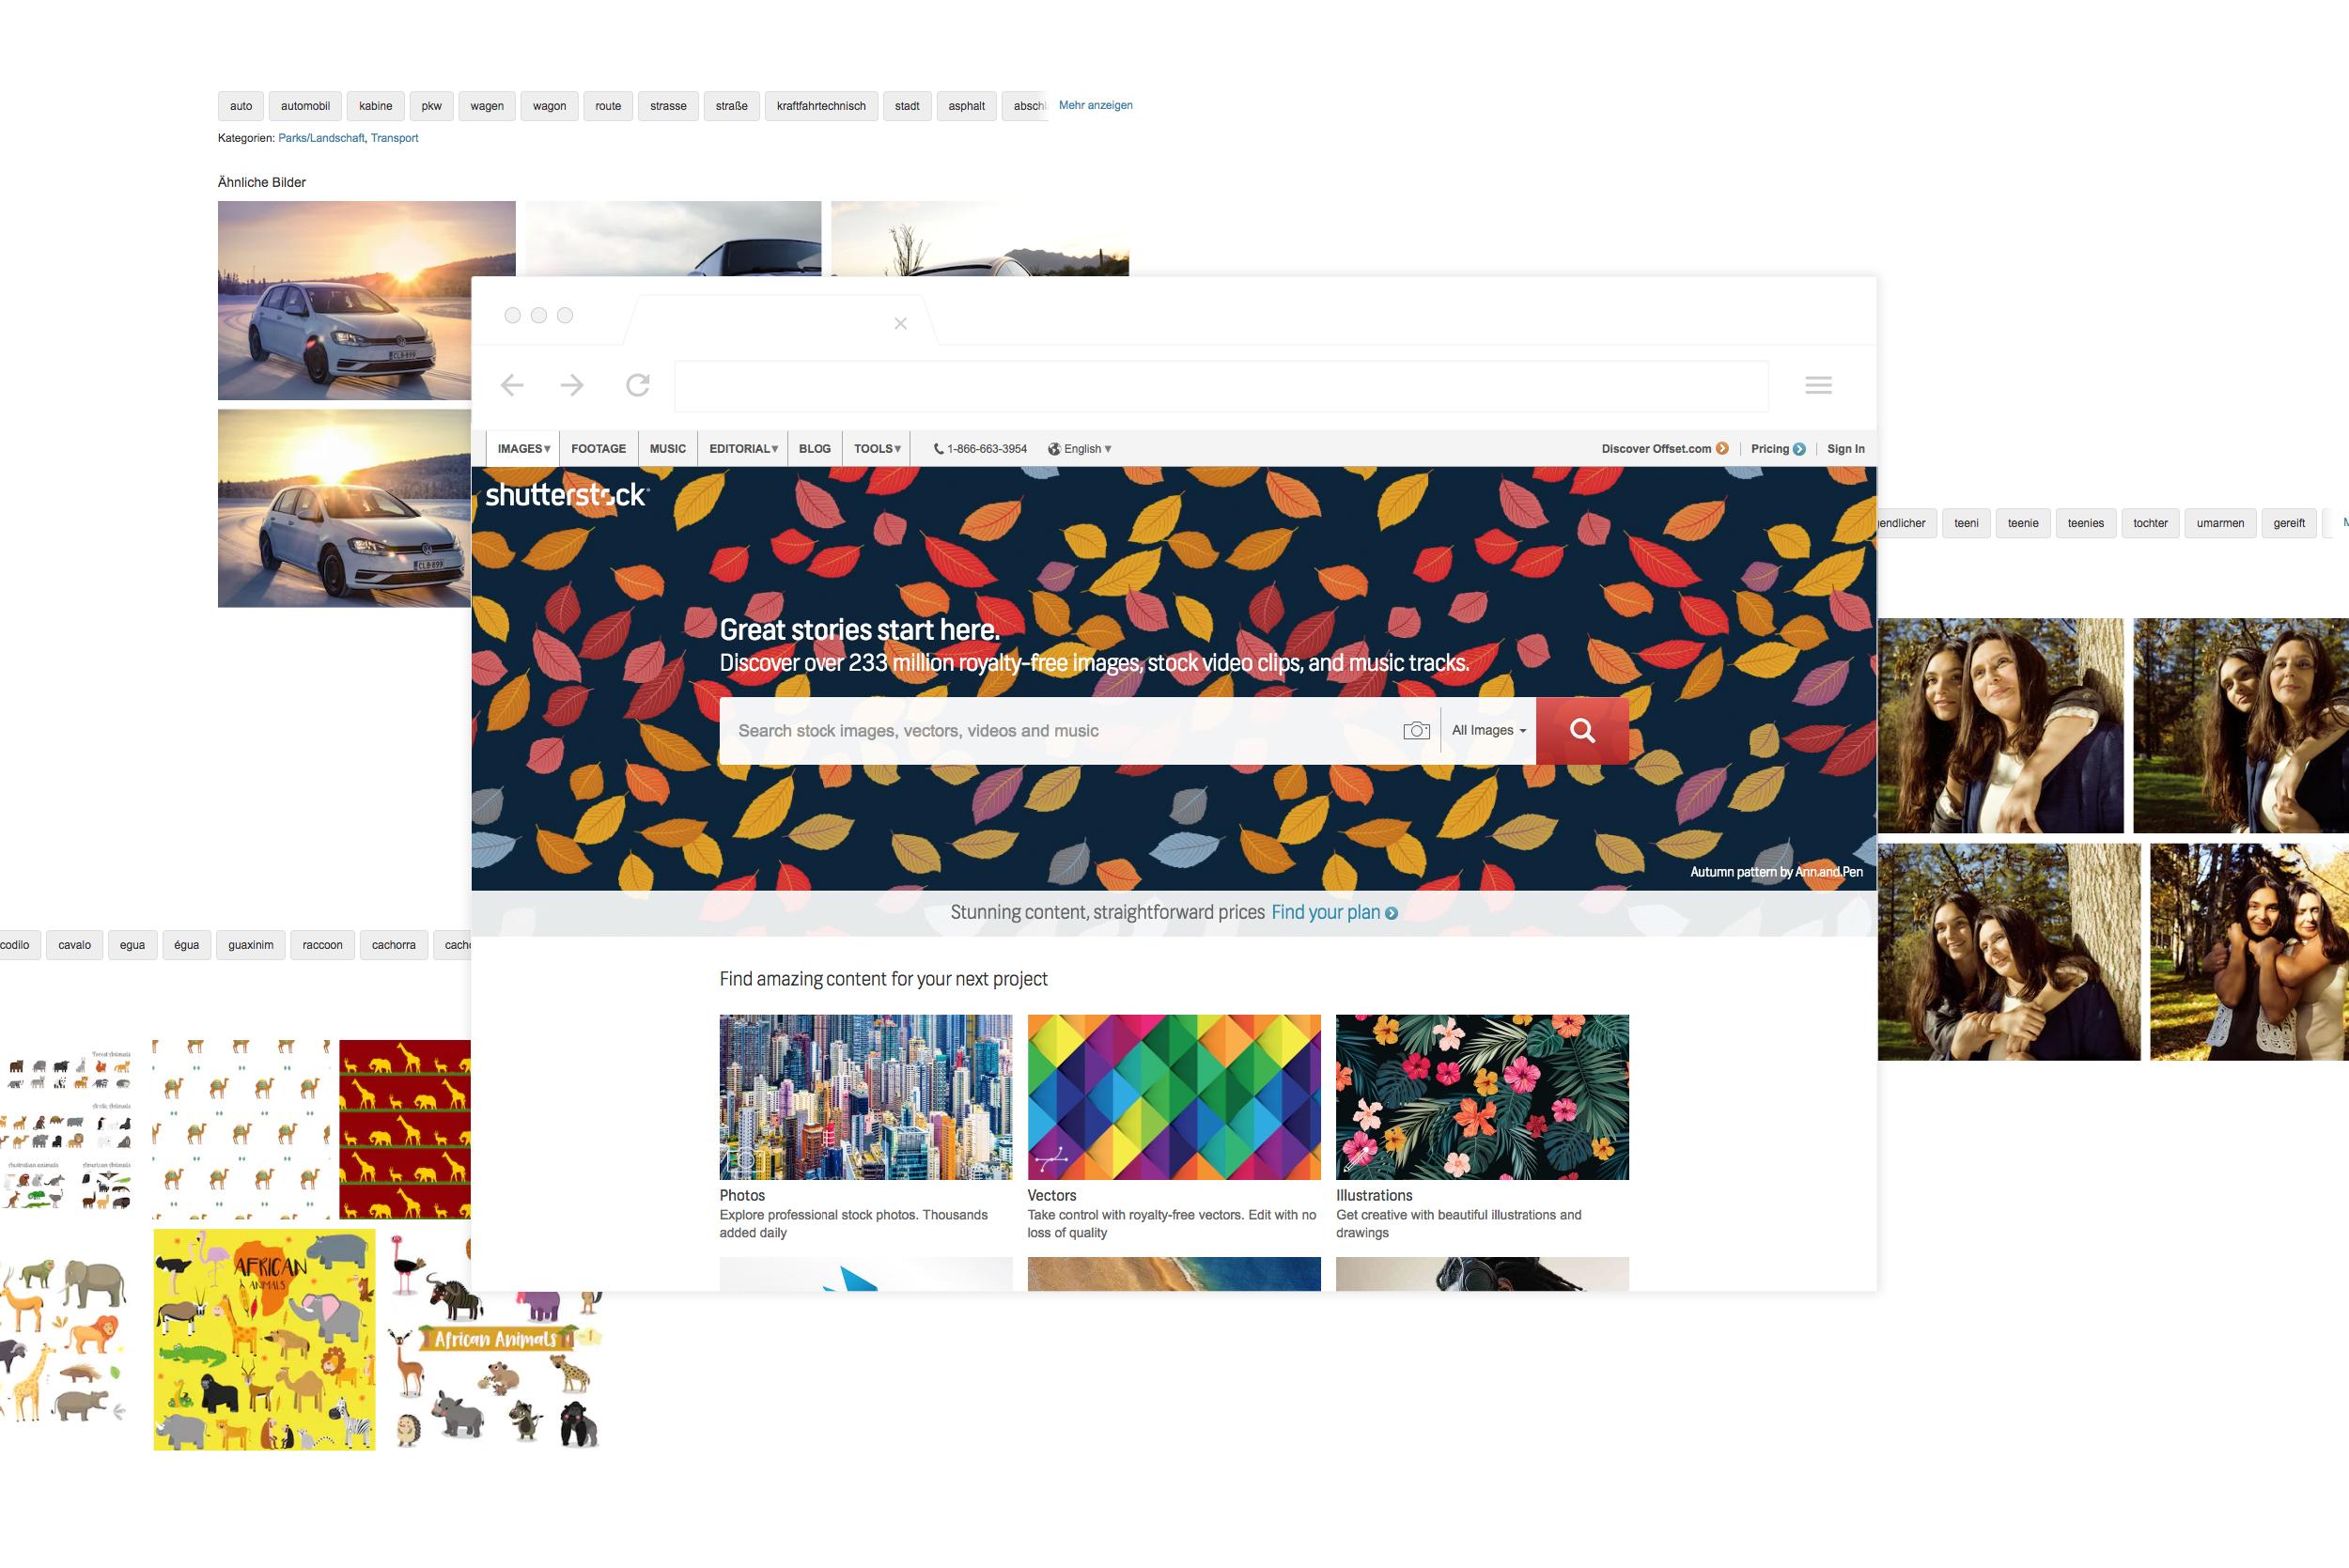 69baa65a8a Shutterstock - Company Cue